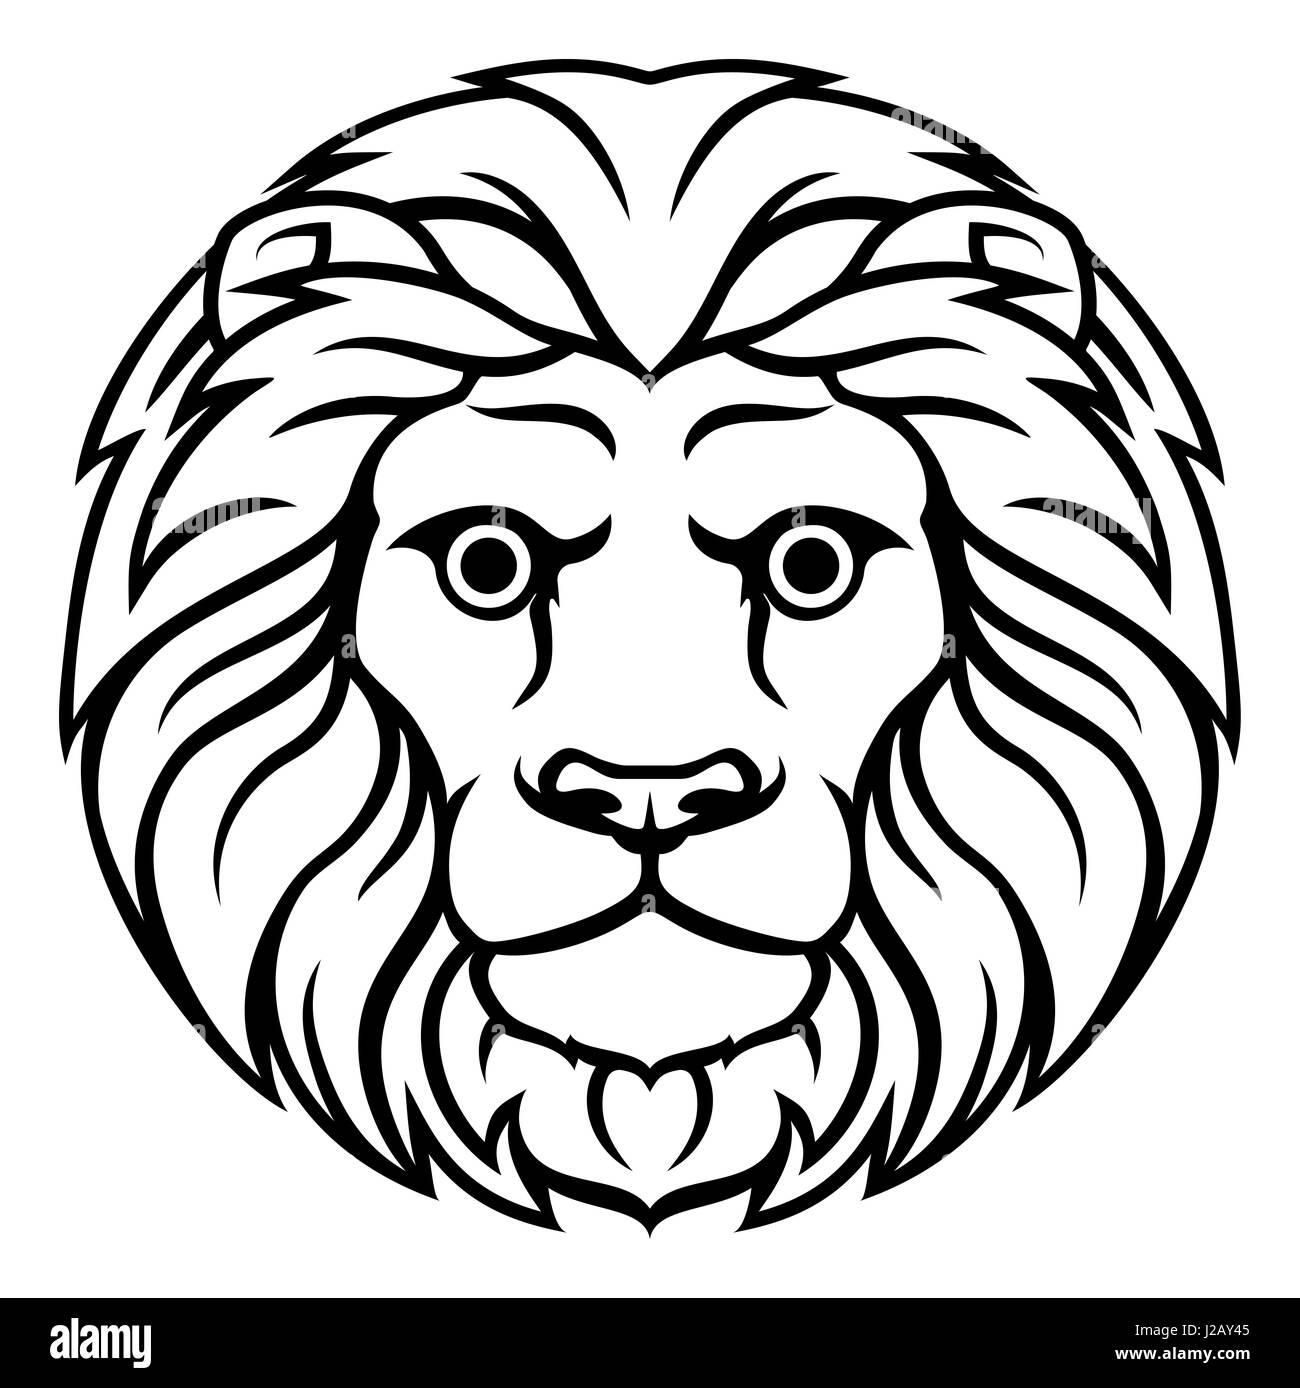 Astrology horoscope zodiac signs circular leo lion symbol stock astrology horoscope zodiac signs circular leo lion symbol biocorpaavc